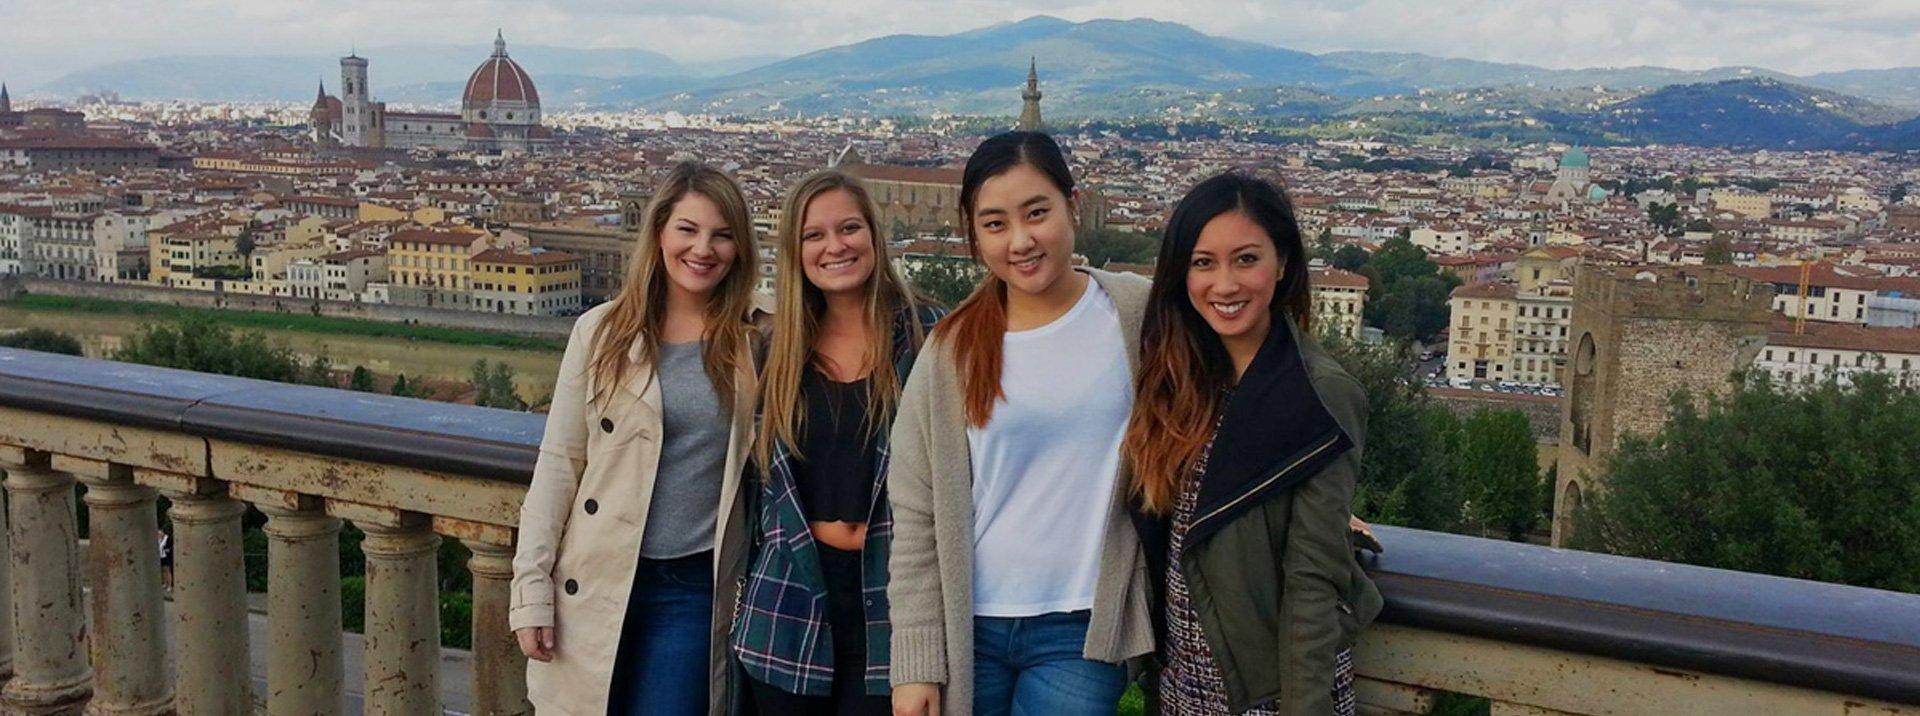 Travel Internships Summer 2020.Fall Internships 2020 Global Experiences